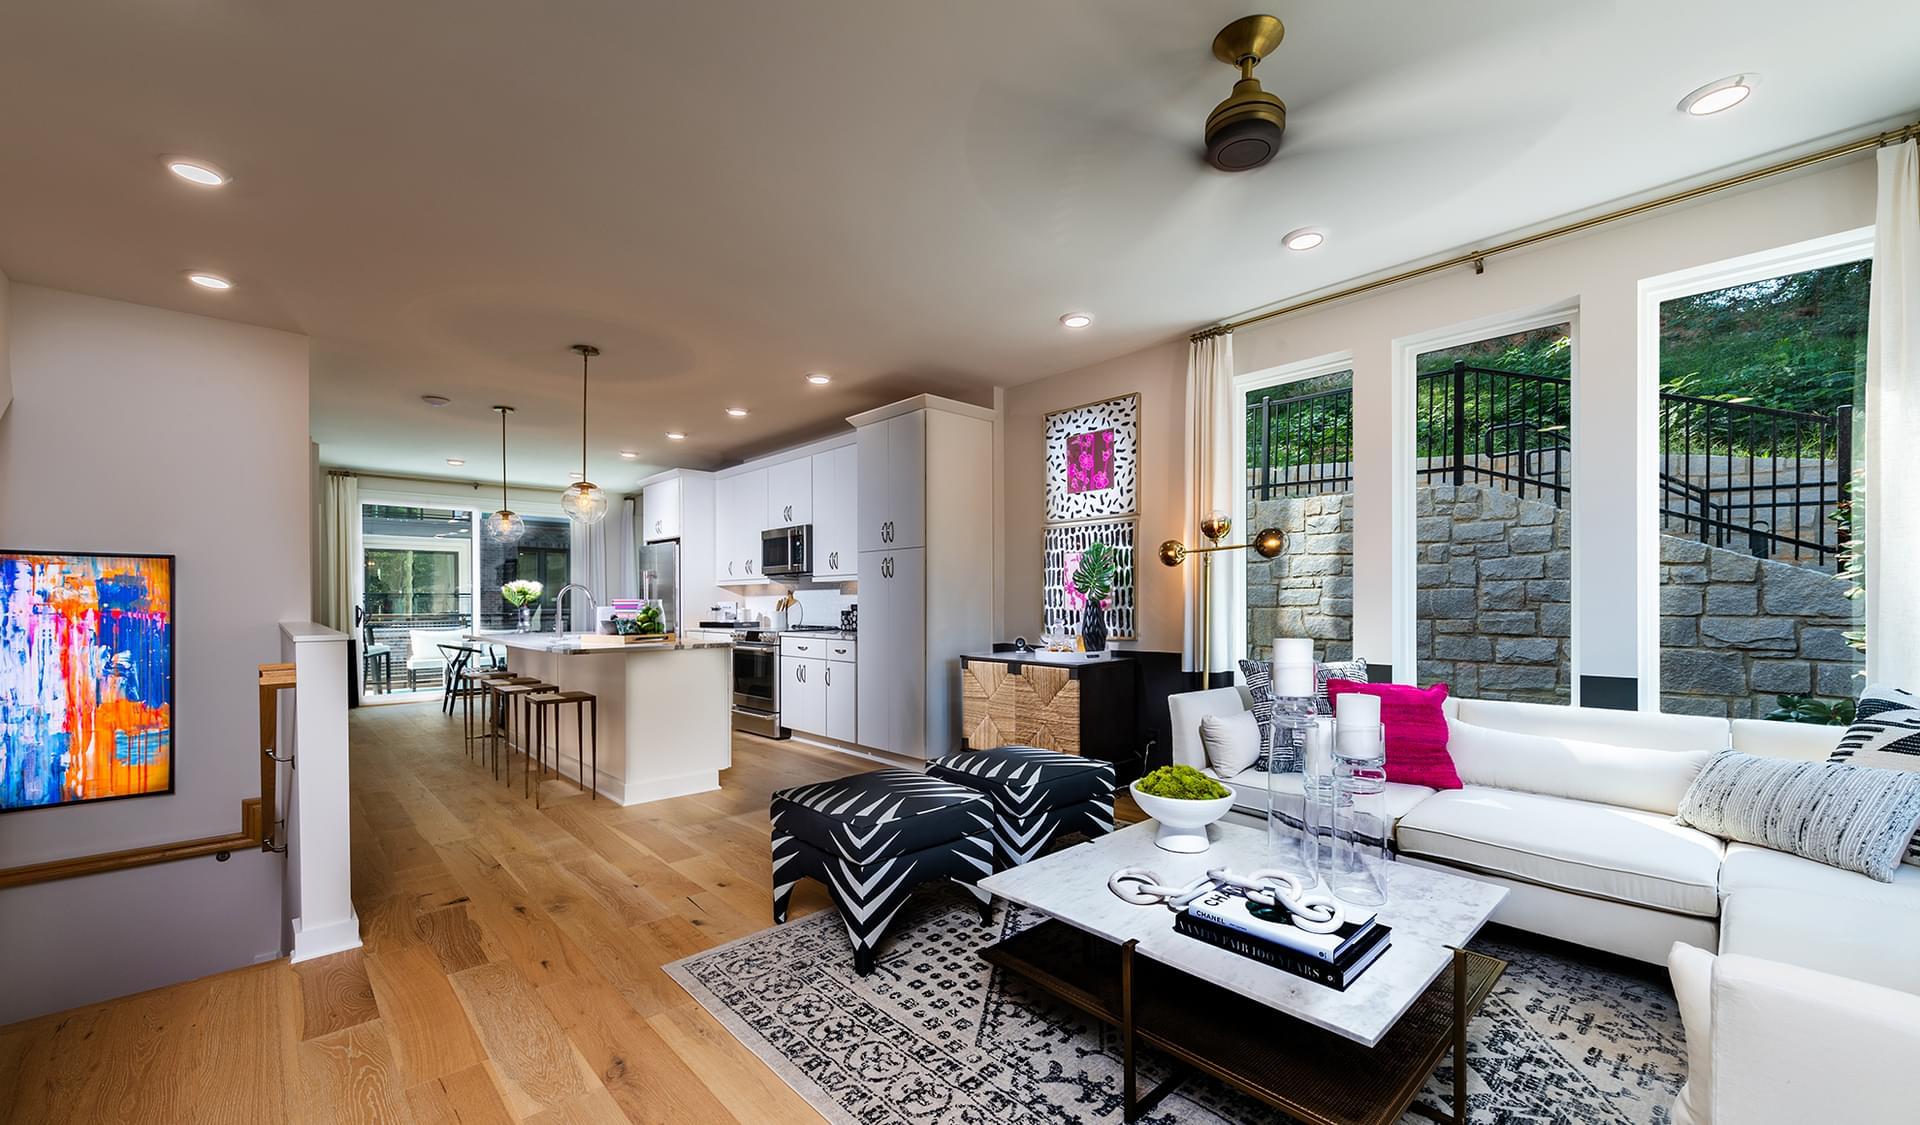 The Courtland New Home in Atlanta GA